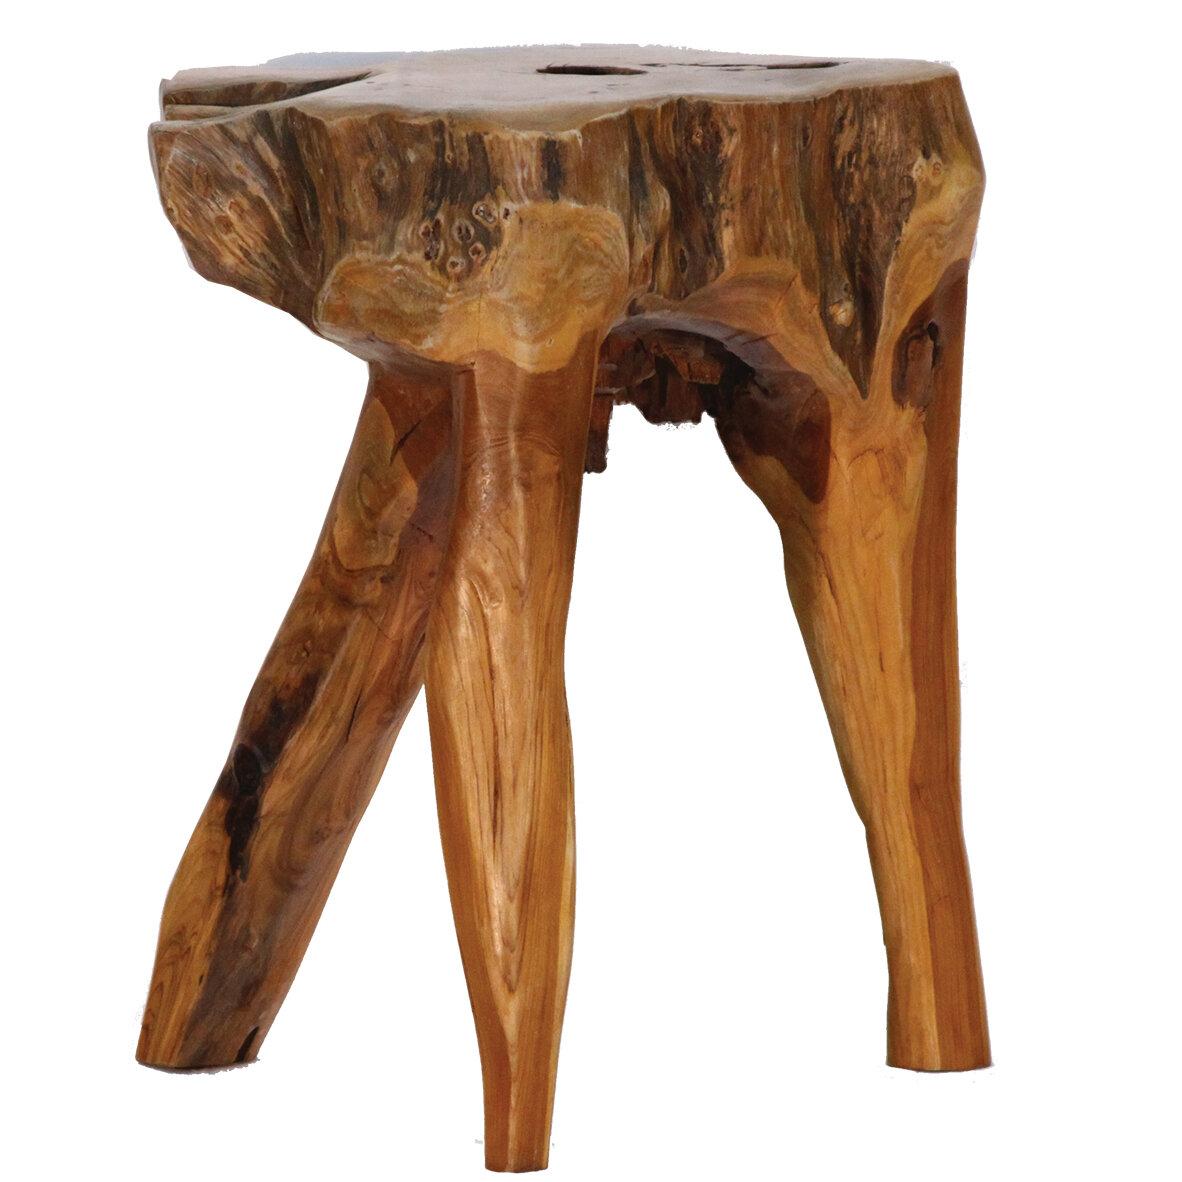 Handmade Wooden Teak Stool Teak Root Carved Stool Furniture Home & Garden